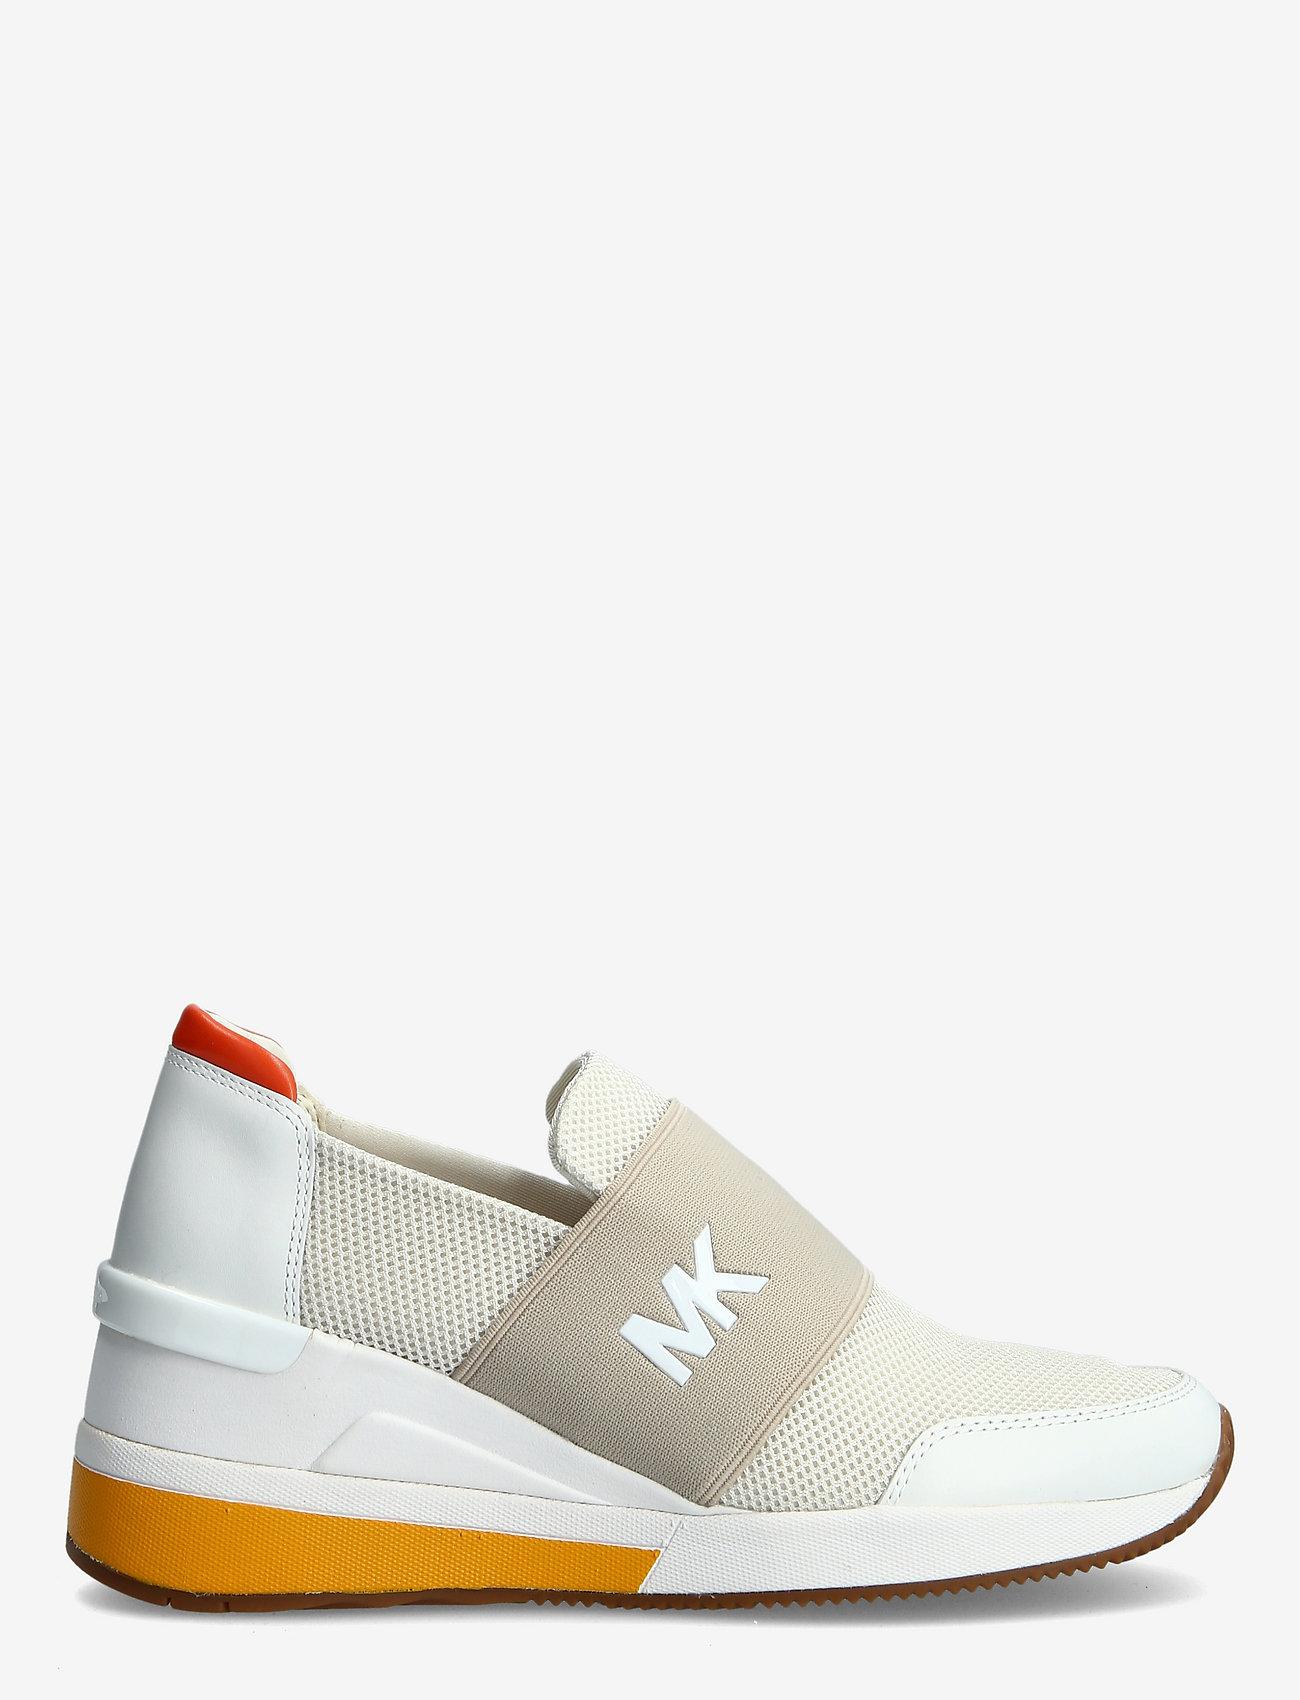 Michael Kors - FELIX TRAINER - lage sneakers - cream multi - 1